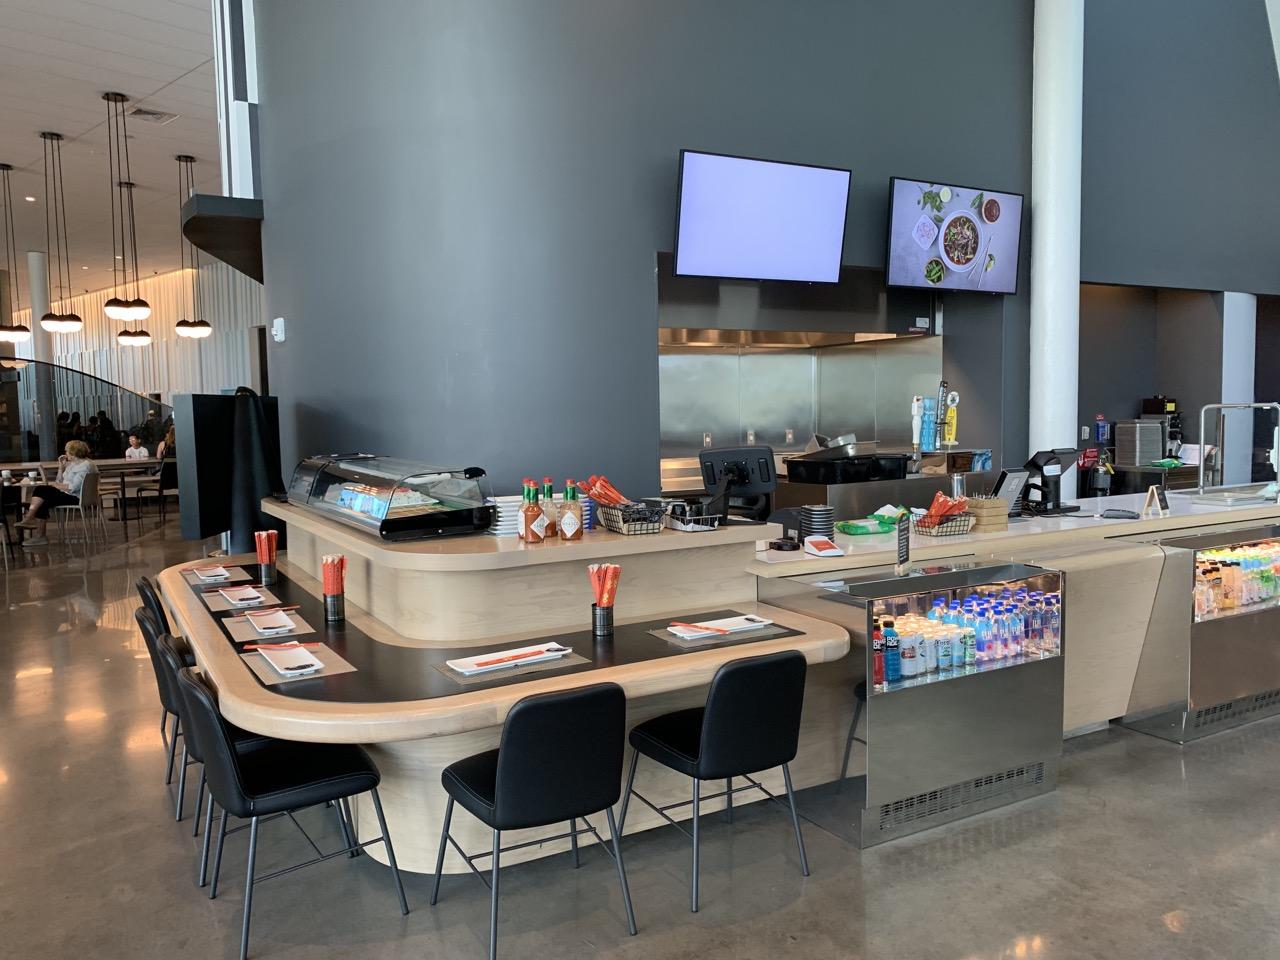 universal aventura hotel review food court 4.jpeg